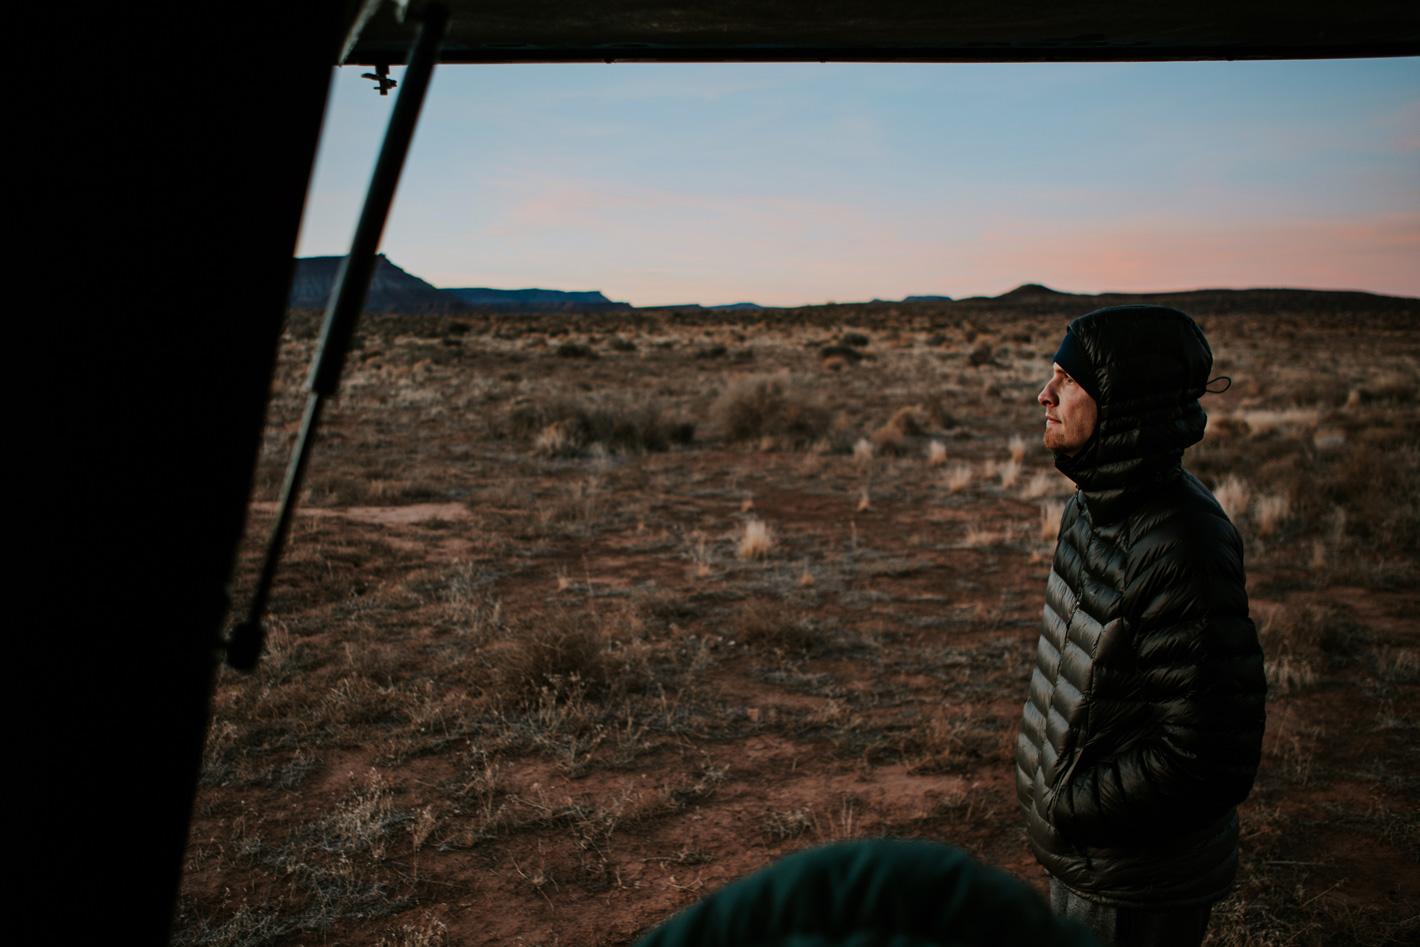 CindyGiovagnoli_Utah_Zion_desert_night_morning_coffee_blm_land_off_grid-006.jpg